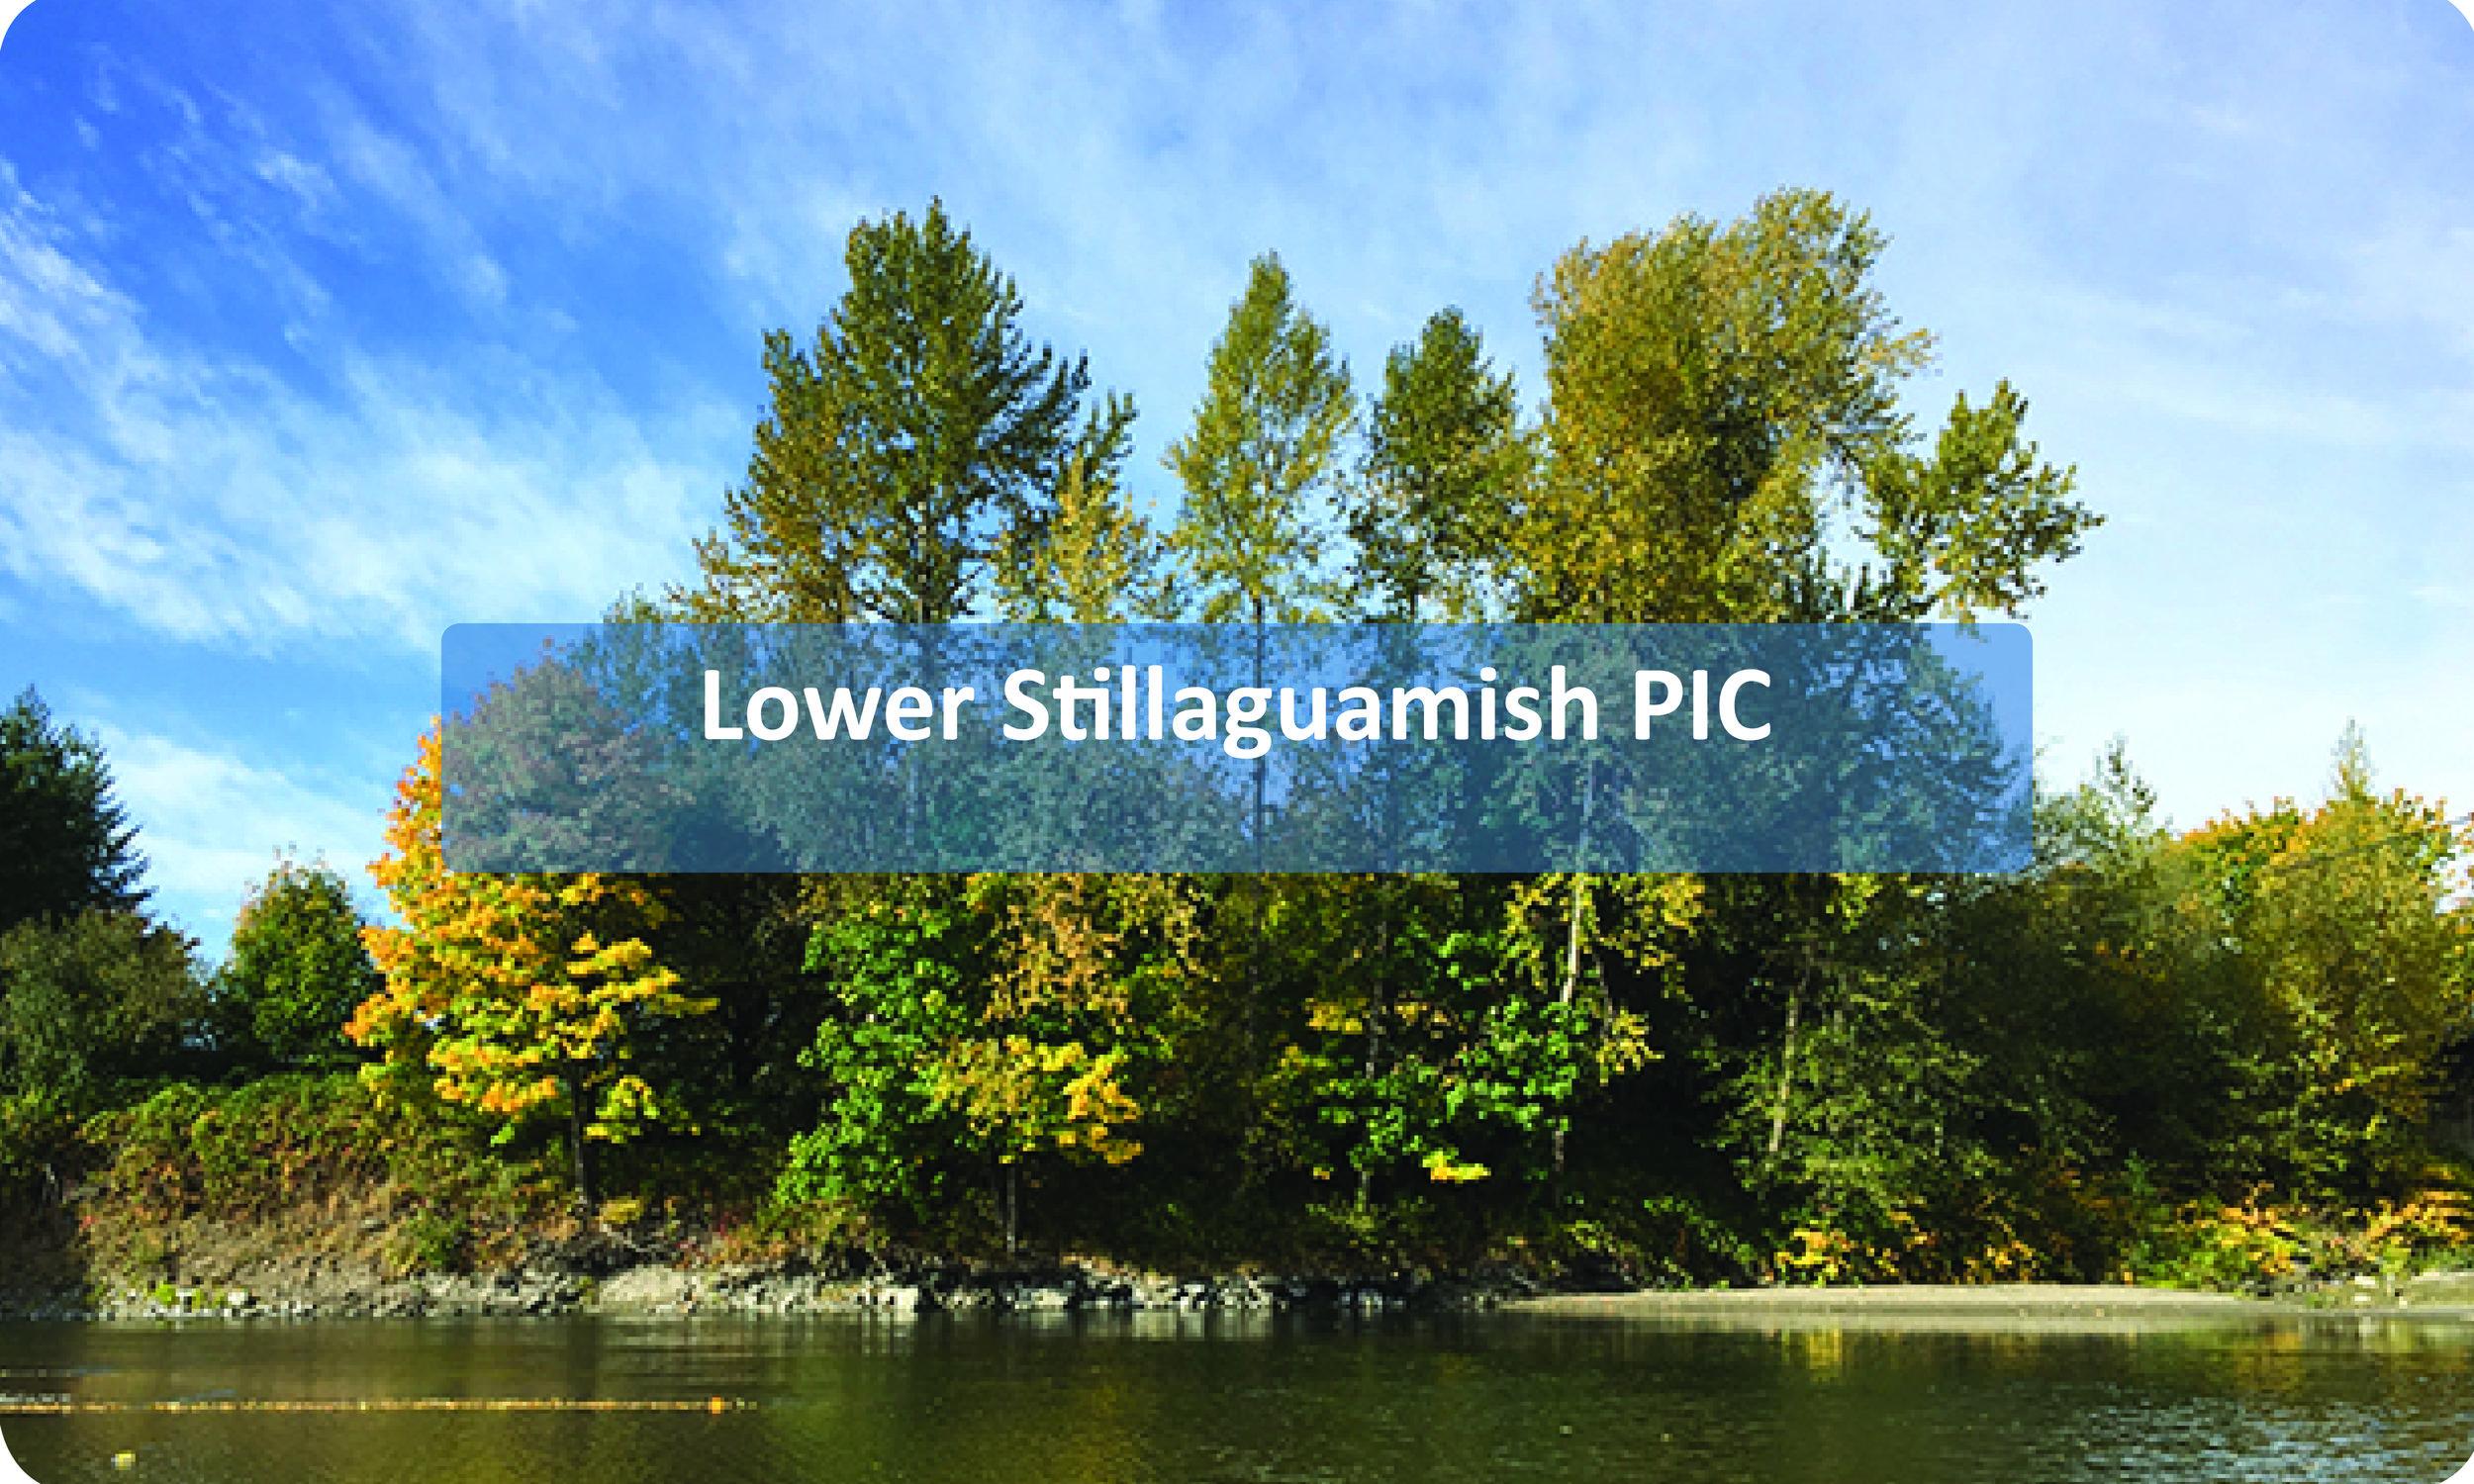 Stillaguamish PIC Project